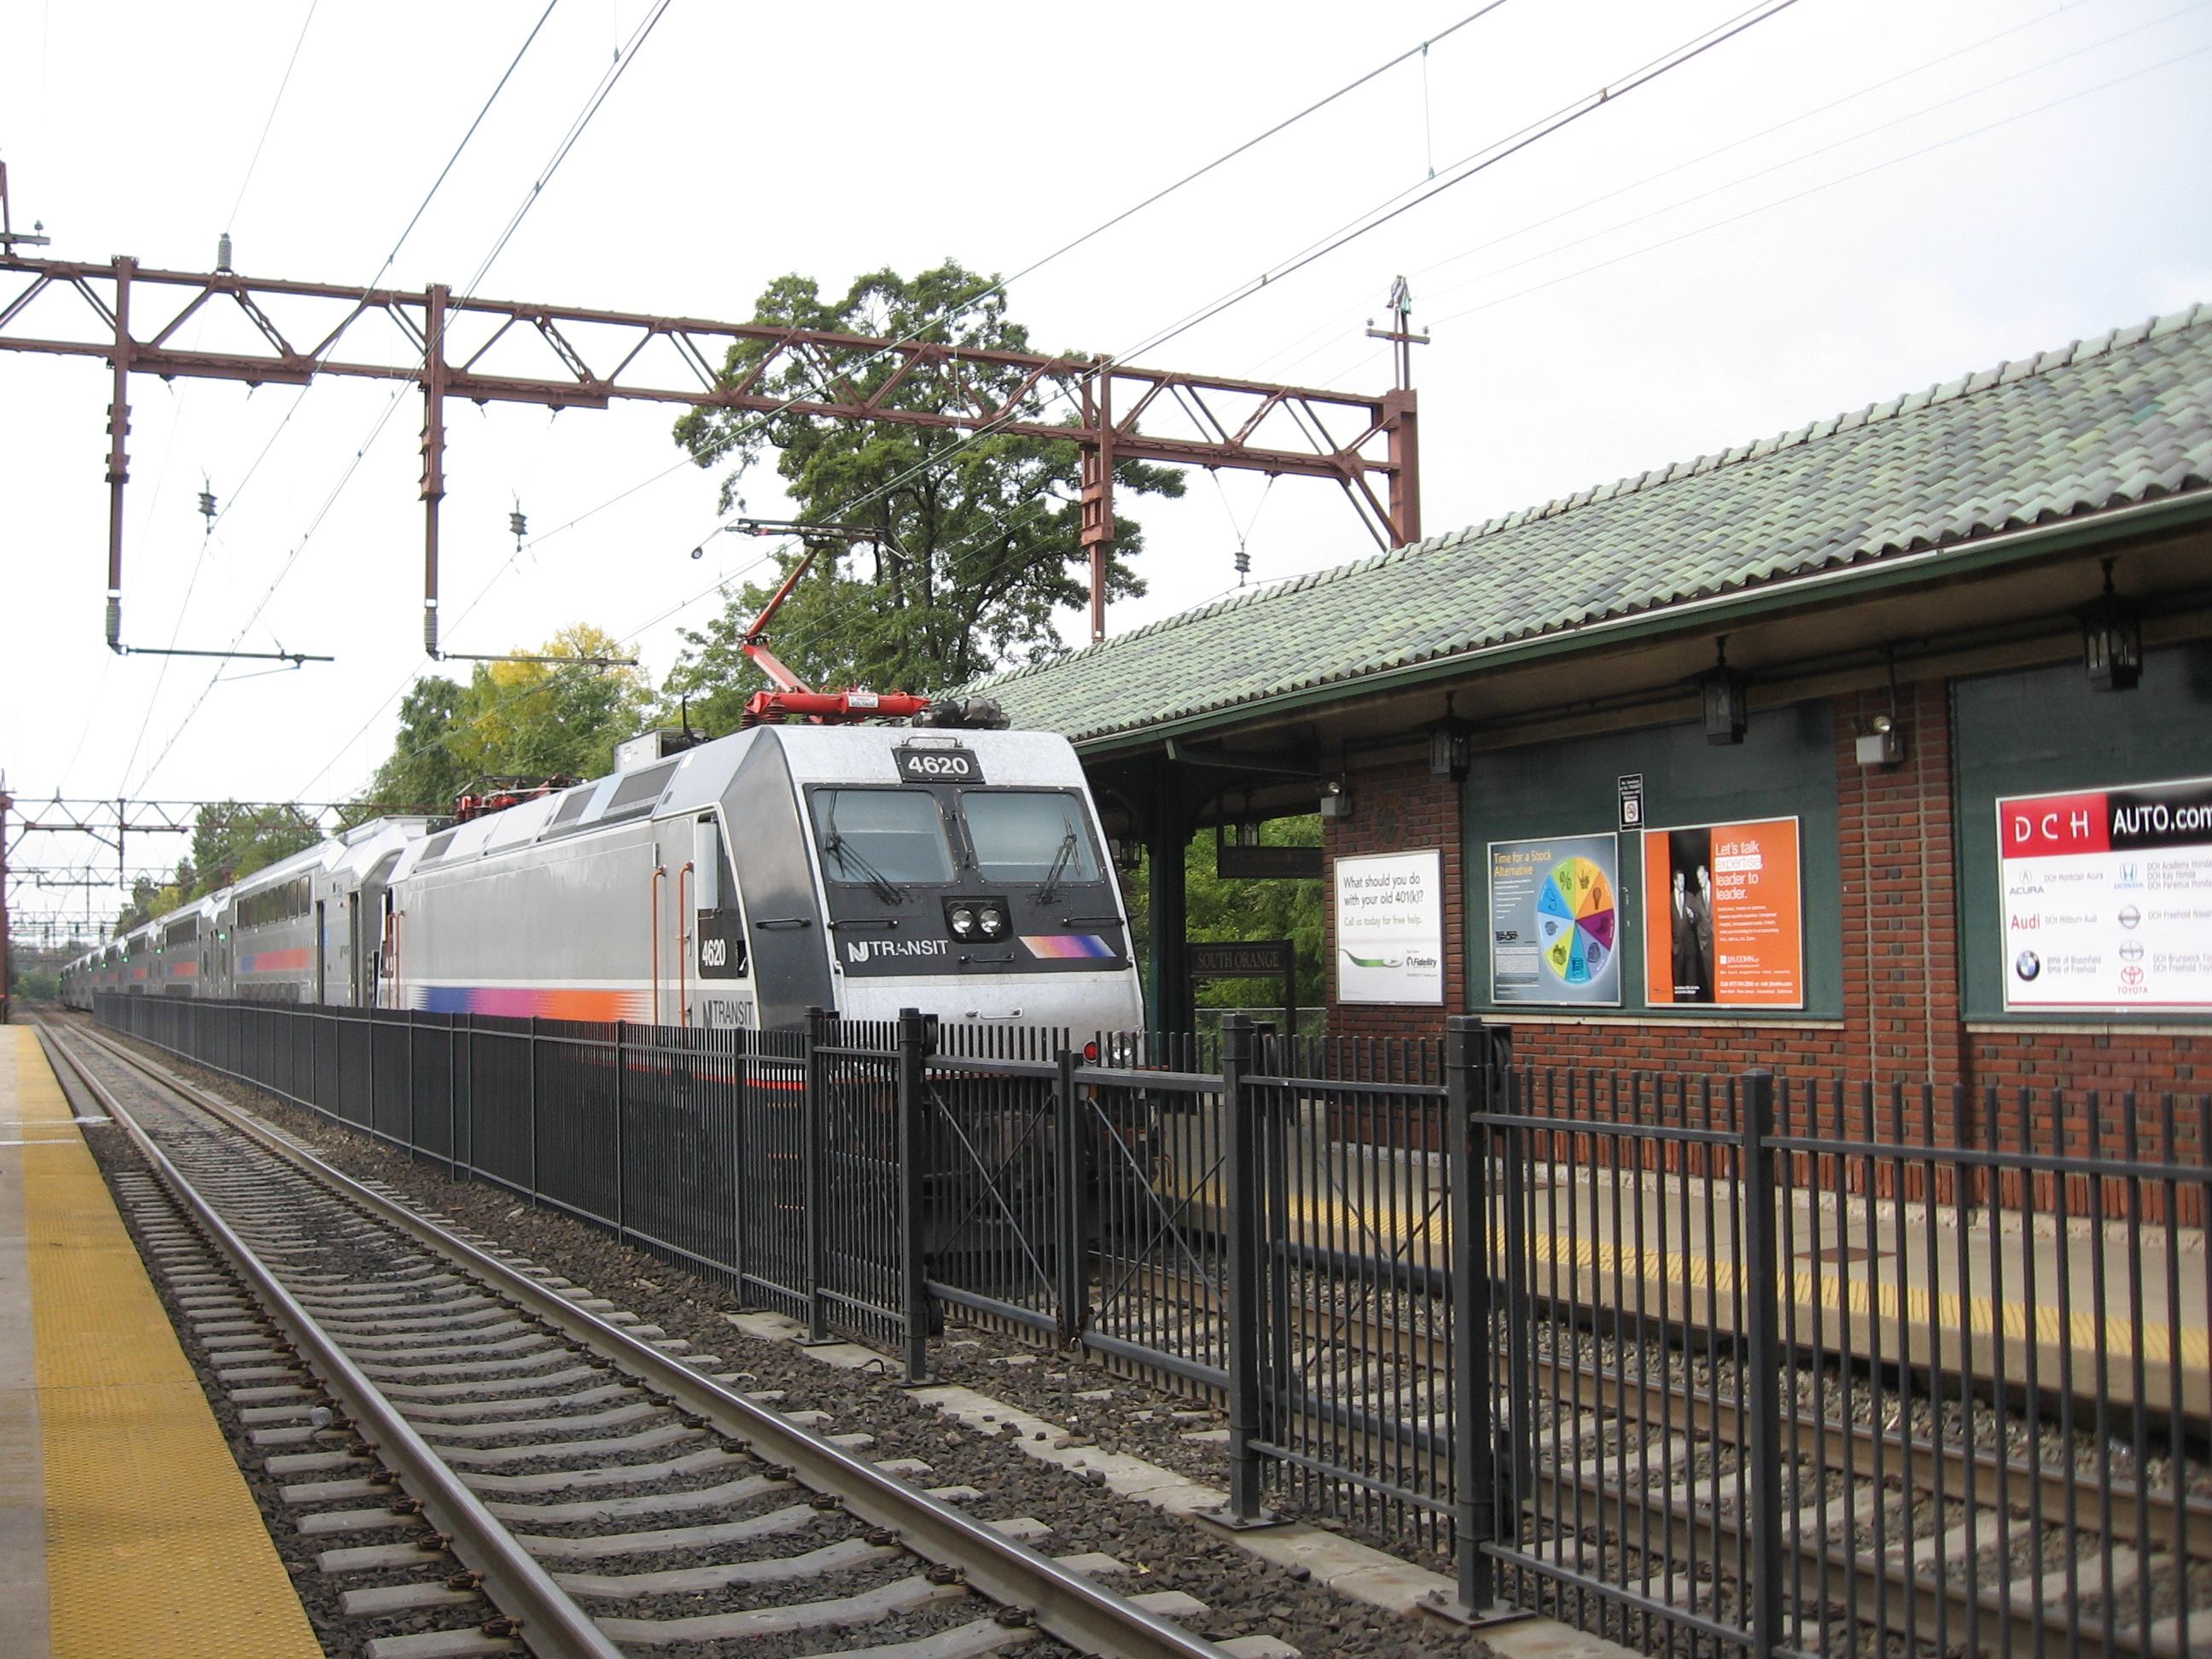 NJ Transit striking up concerns on campus